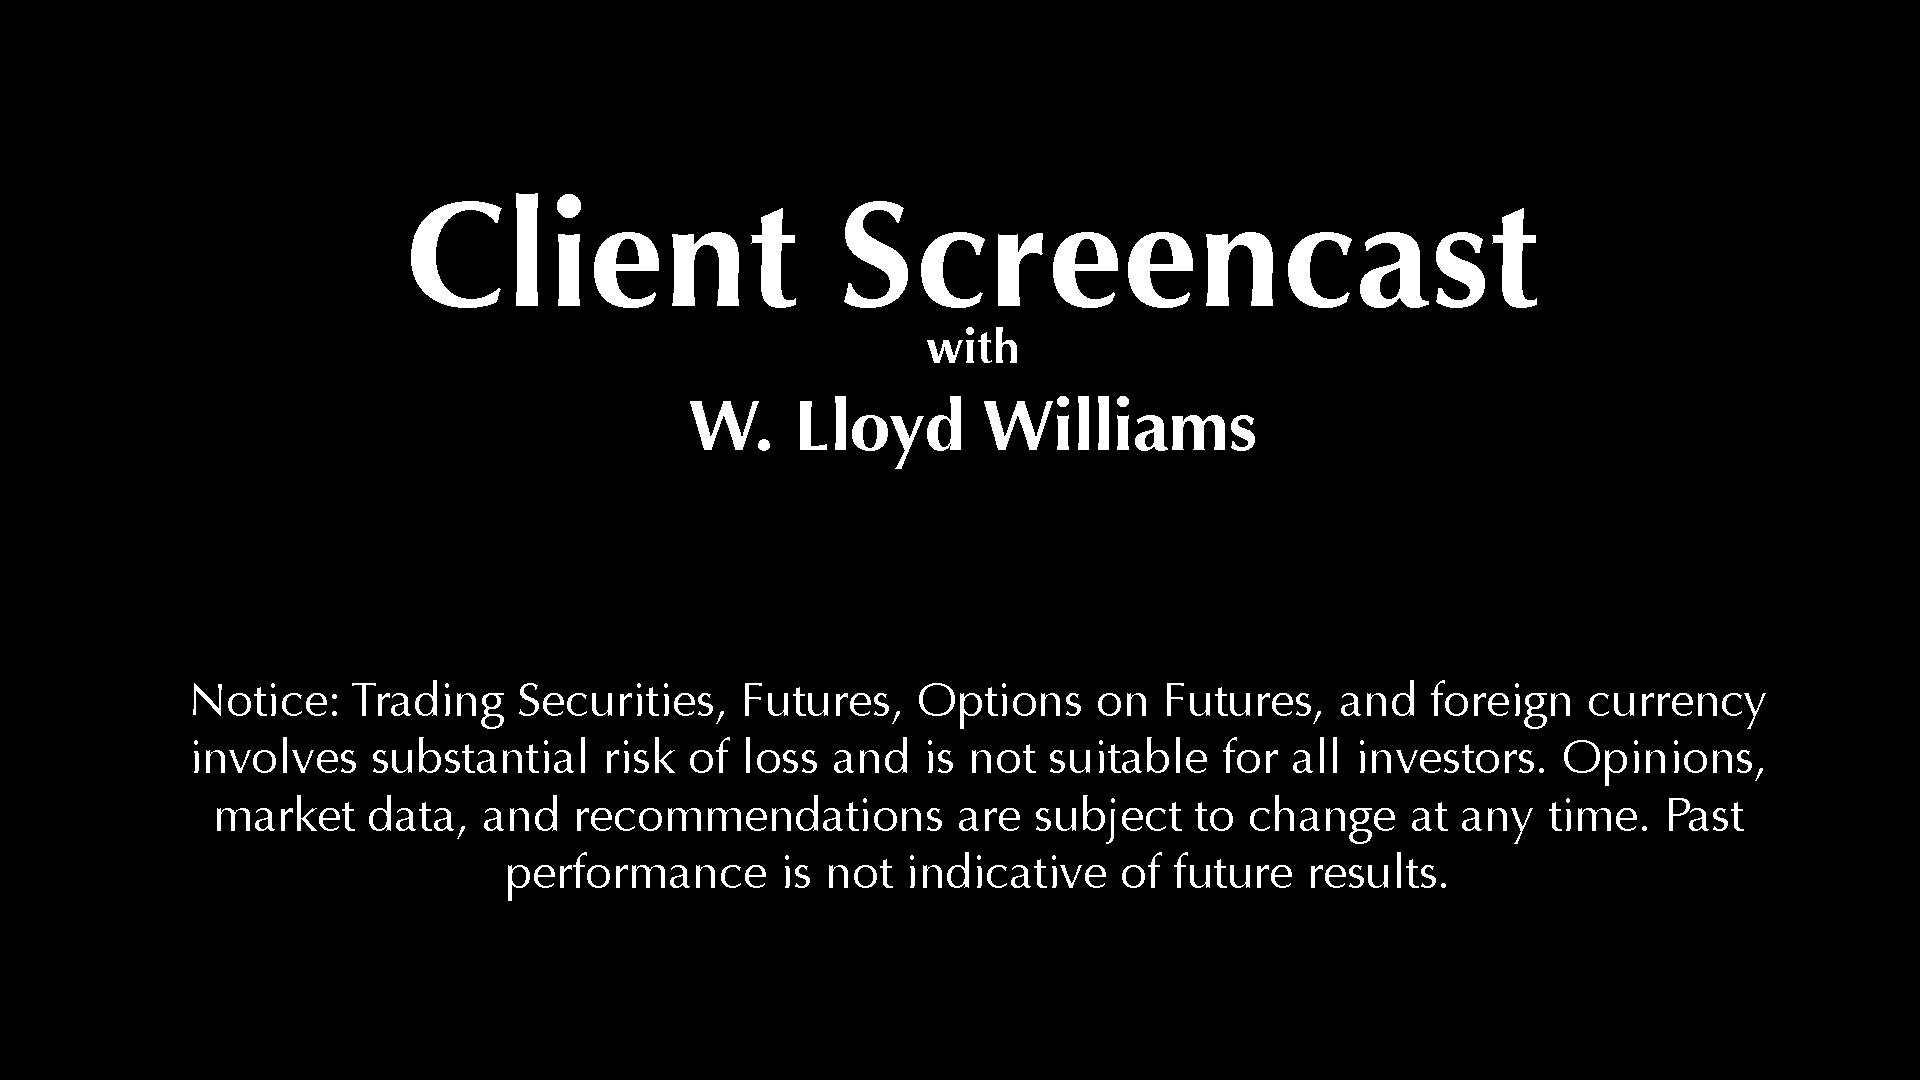 Client_Screencast_splashscreen.jpg